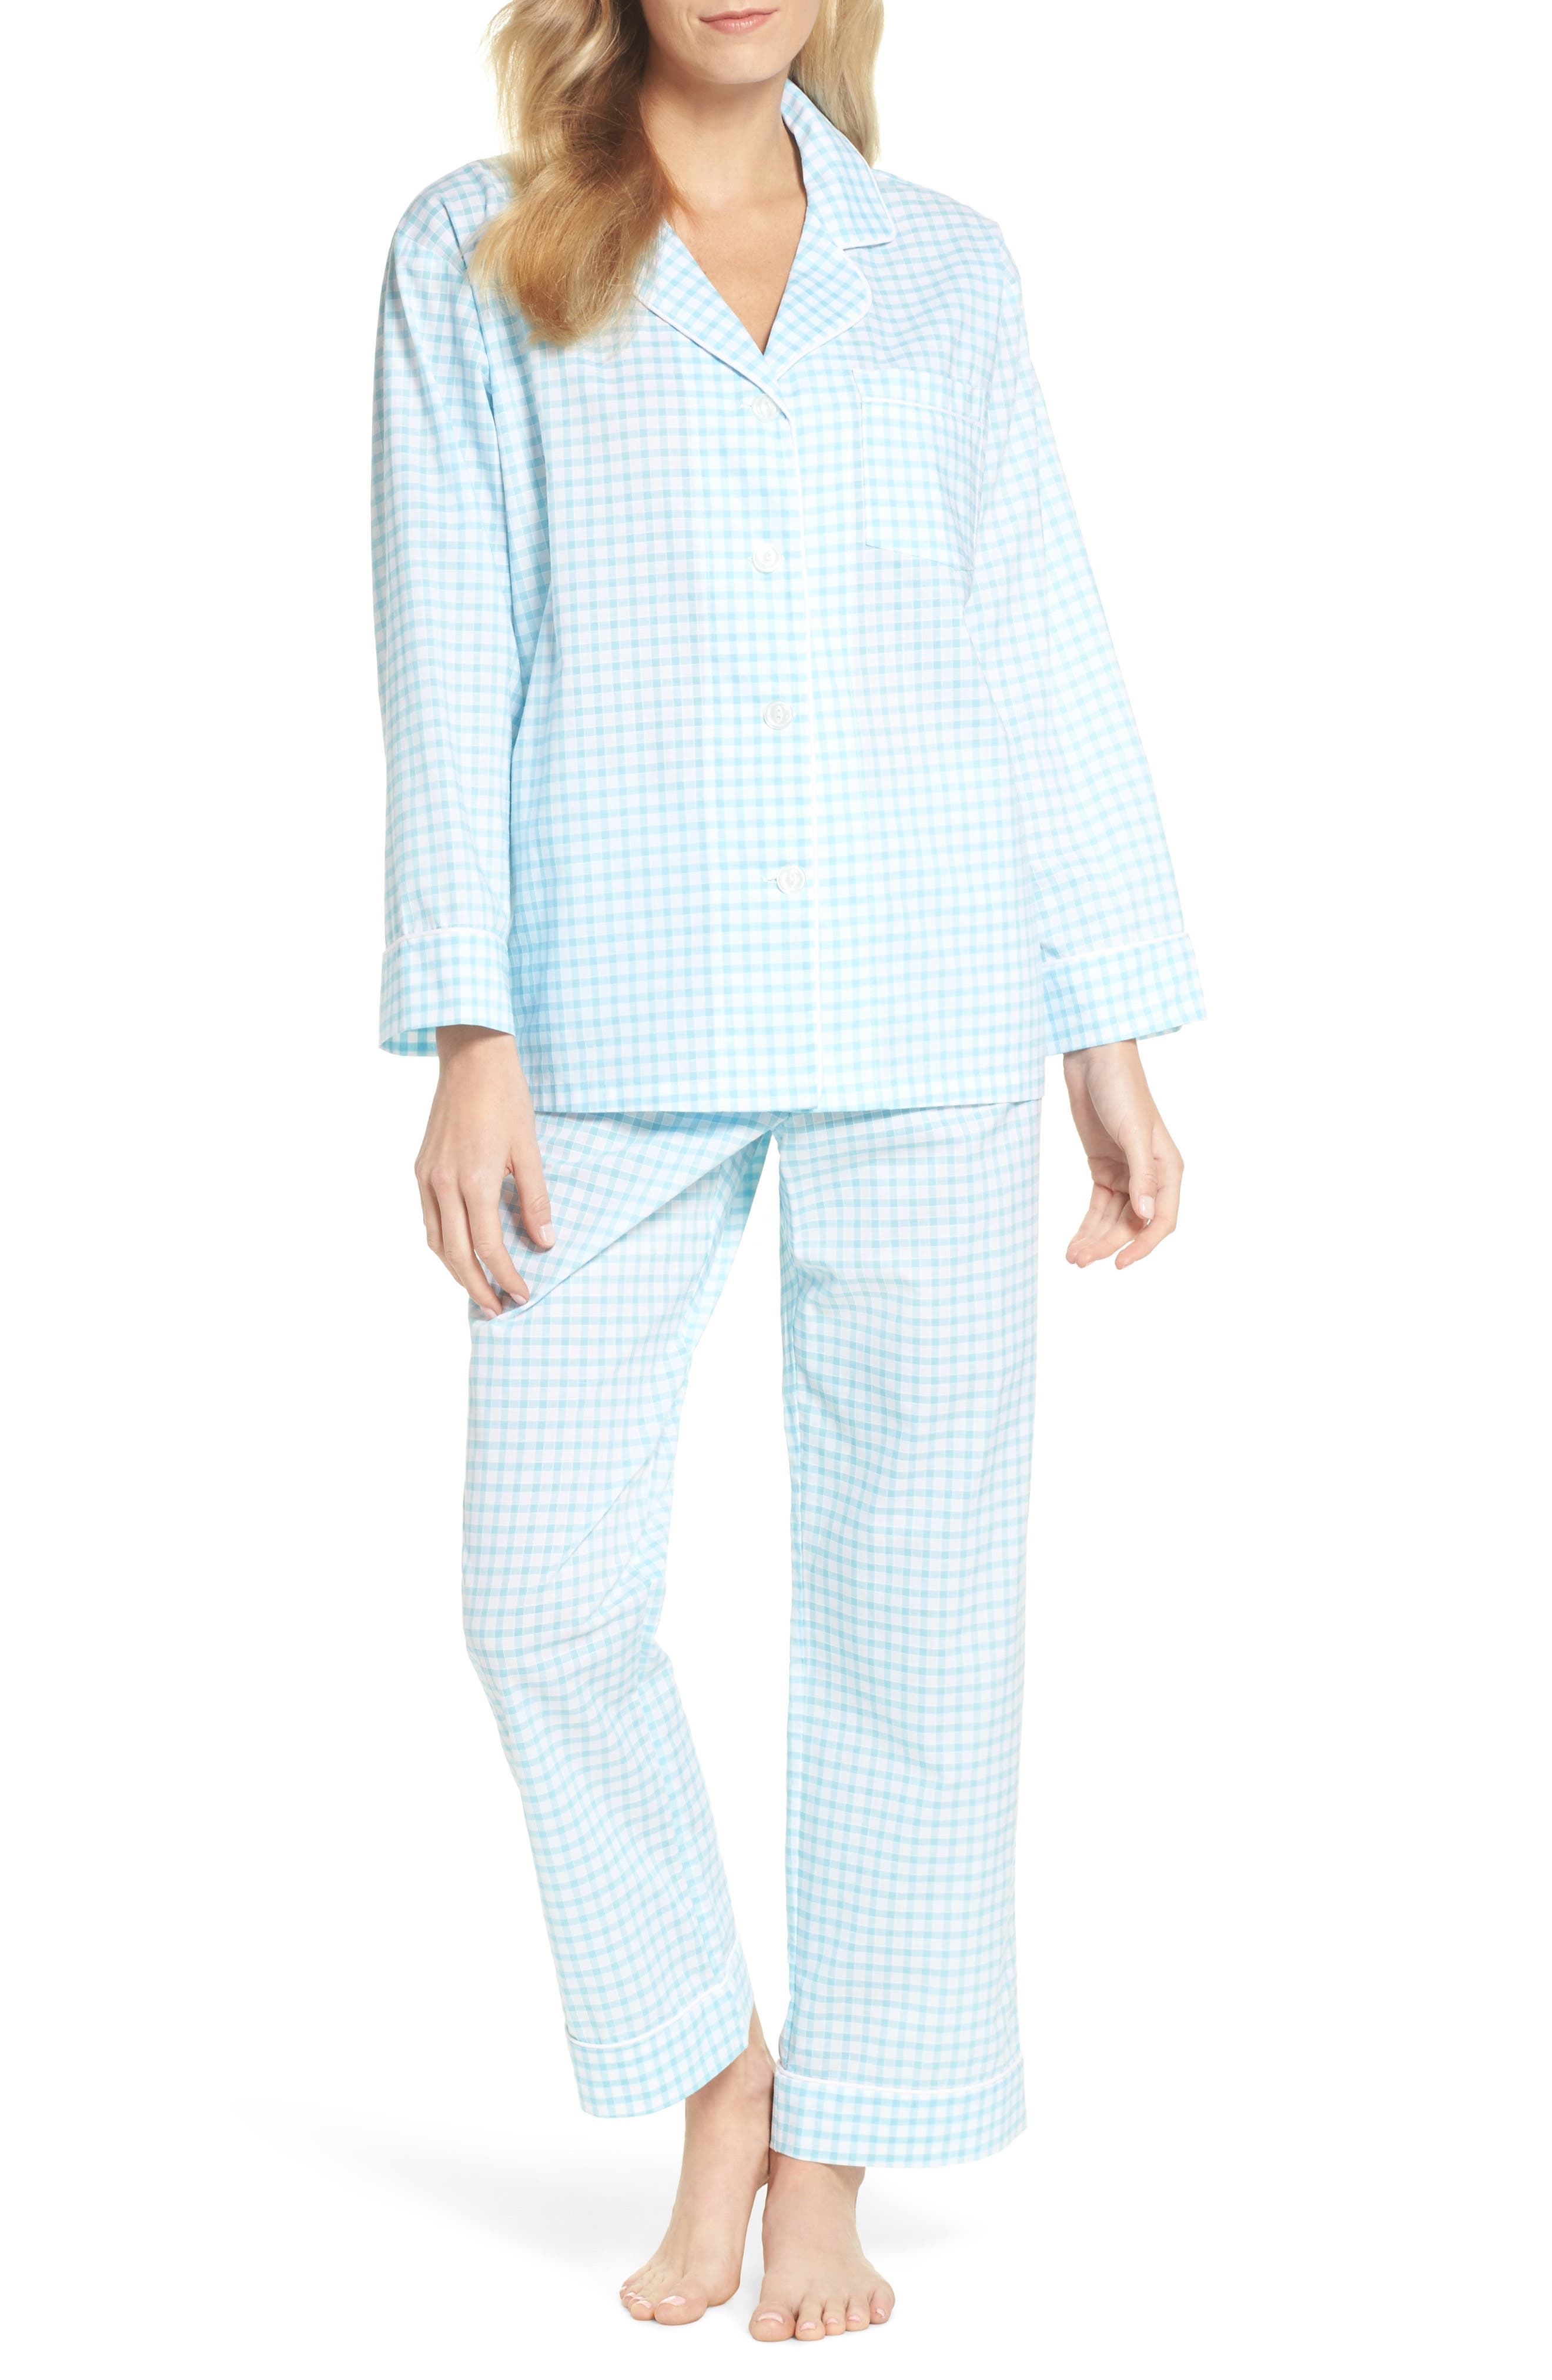 Gingham Pajamas,                         Main,                         color, Aqua Gingham